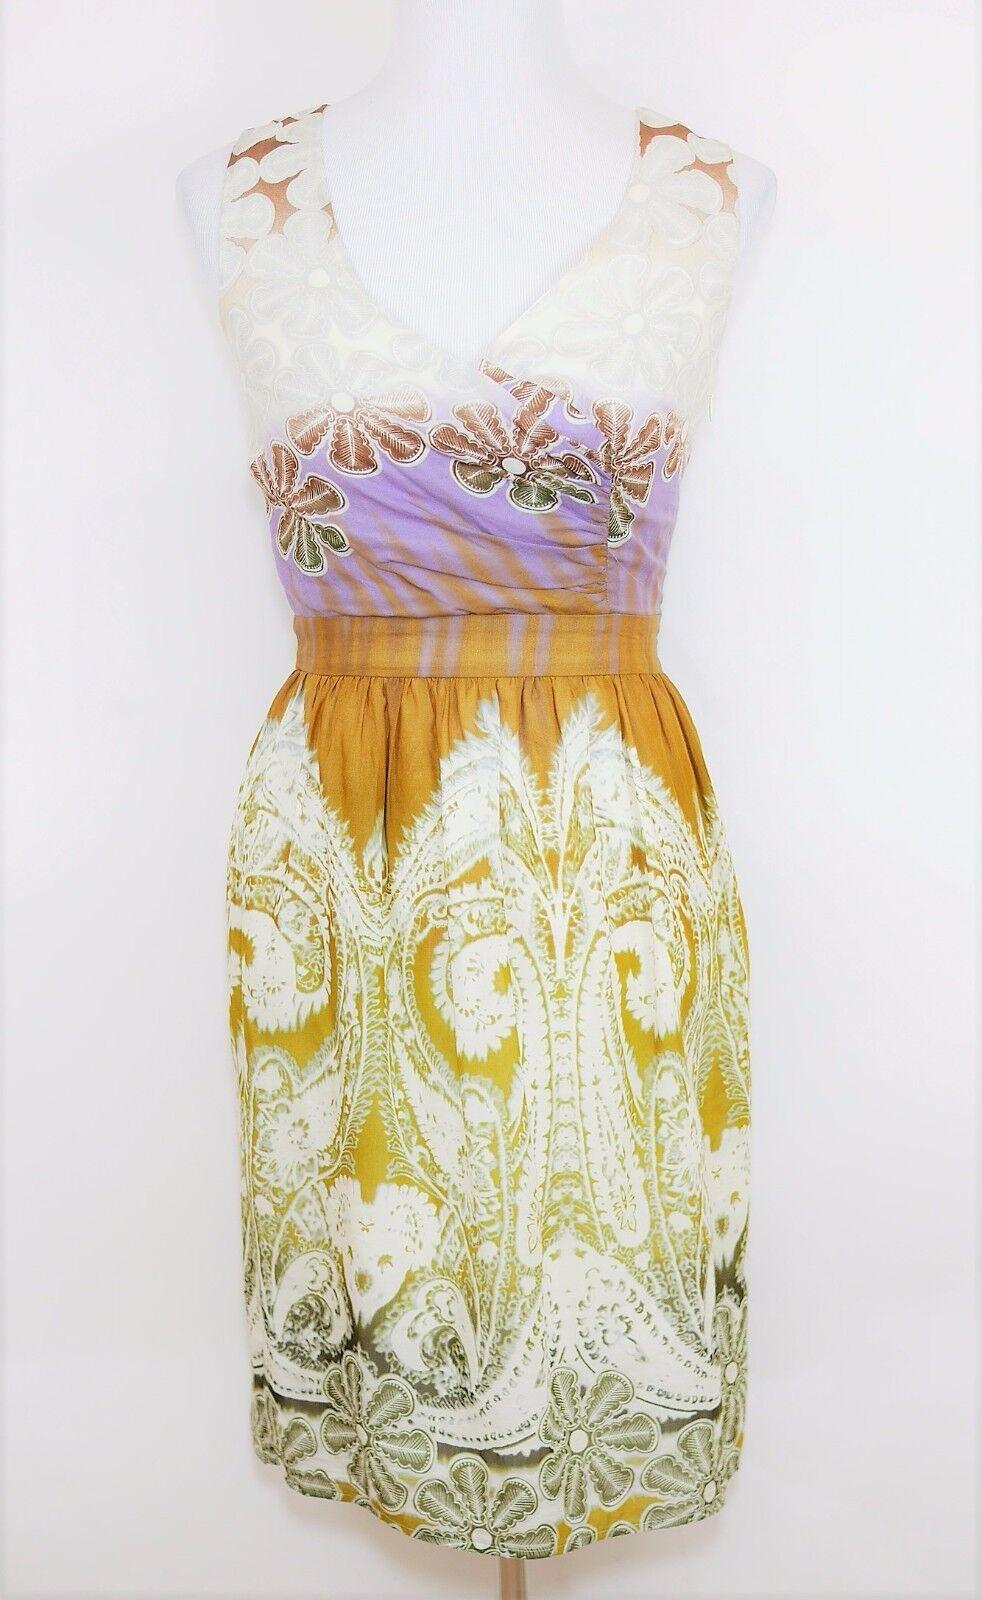 New BURLAPP Women's S - WHITE PURPLE BROWN FLORAL SLEEVELESS DRESS Knee Length